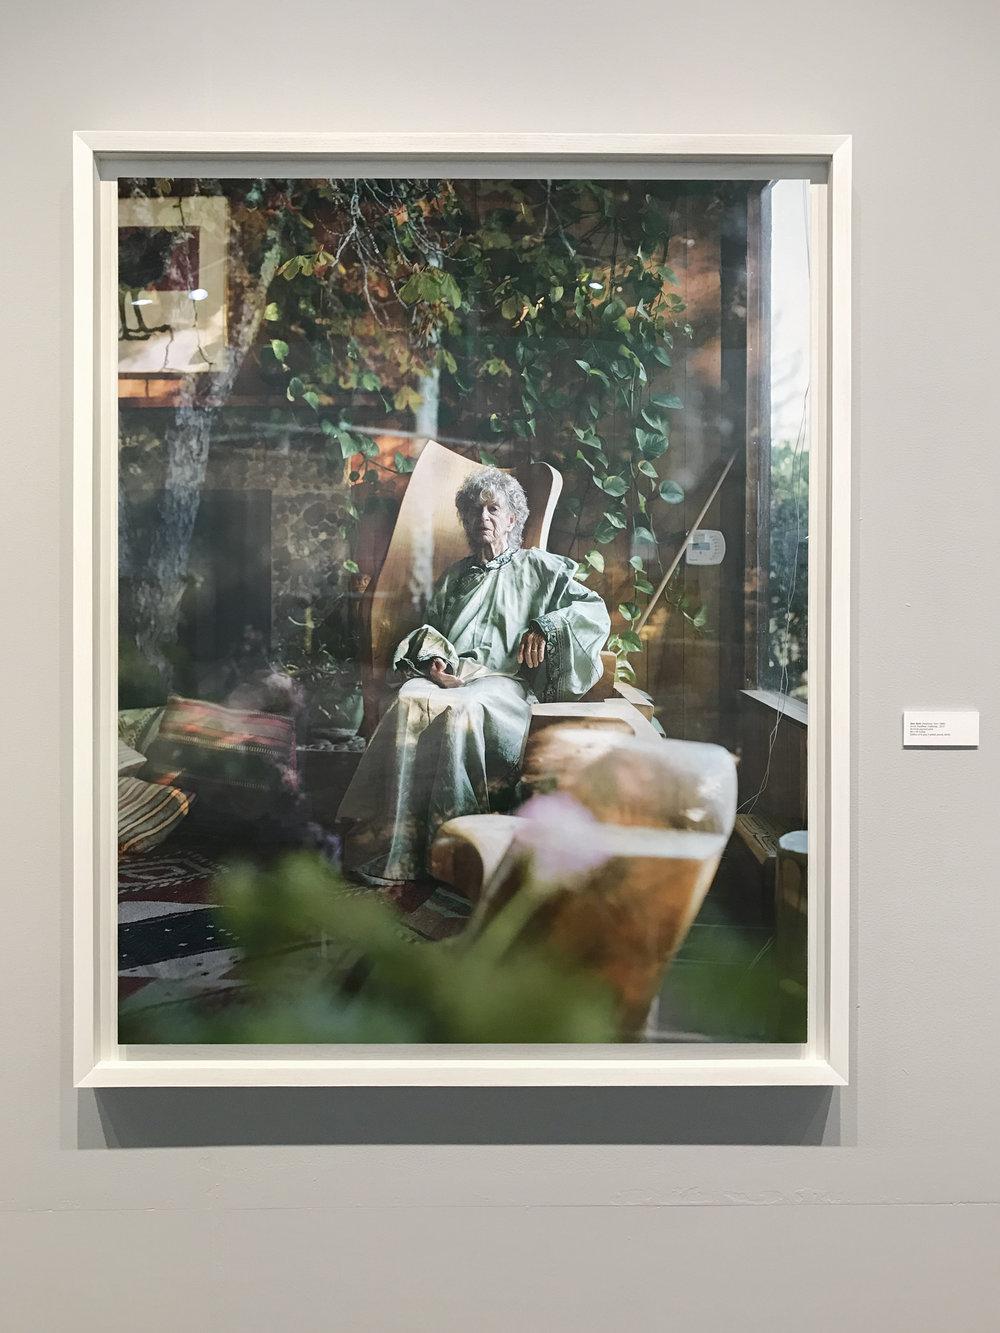 Alec Soth,  Anna. Kentfield, California , 2017, archival pigment print, 50 x 40 inches